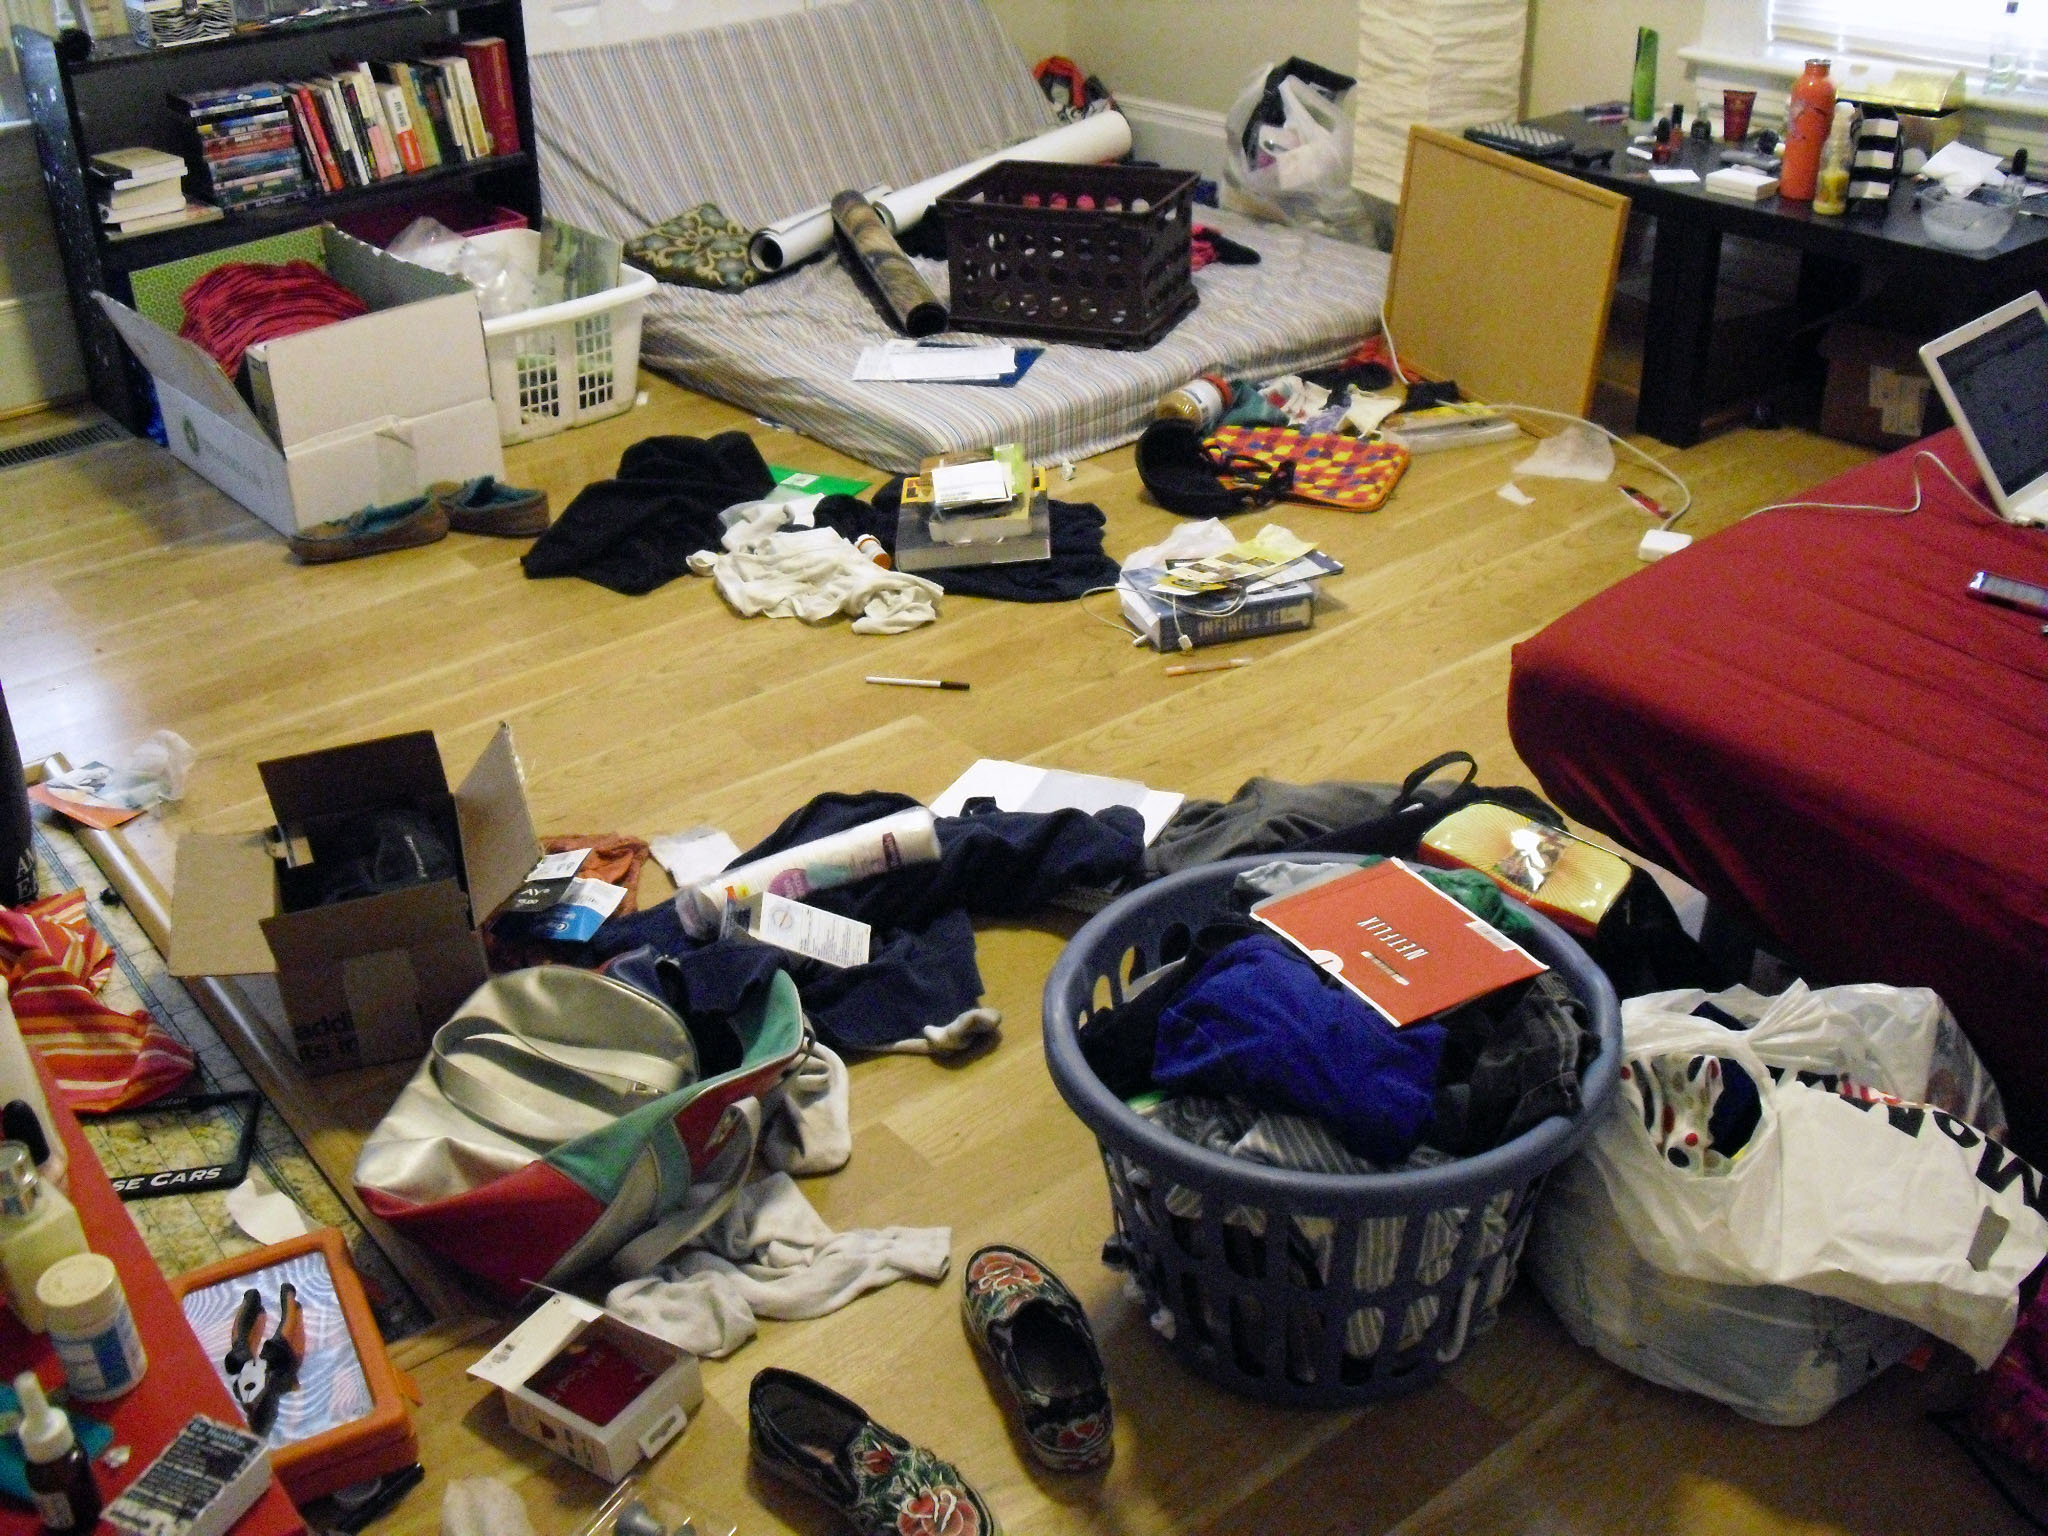 messy room essay messy room essay yahoo education homework help messy room essay academicmessy room essay moved permanently